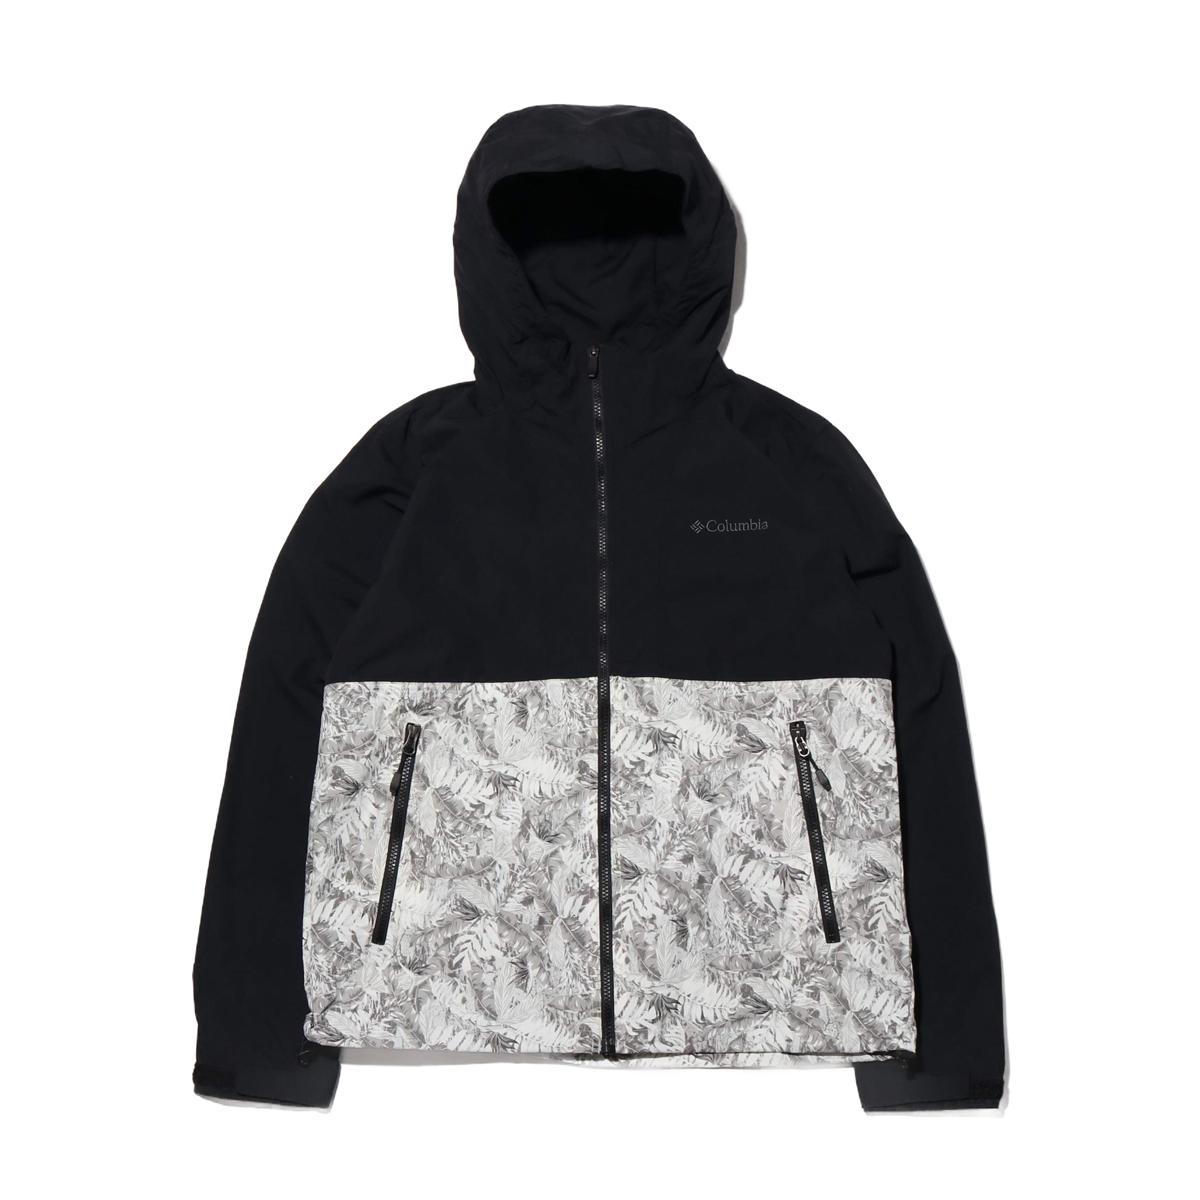 Columbia Hazen™ Patterned Jacket(White Timberwolf)(コロンビア ヘイゼン™ パターンドジャケット)【メンズ】【ジャケット】【20SS-I】